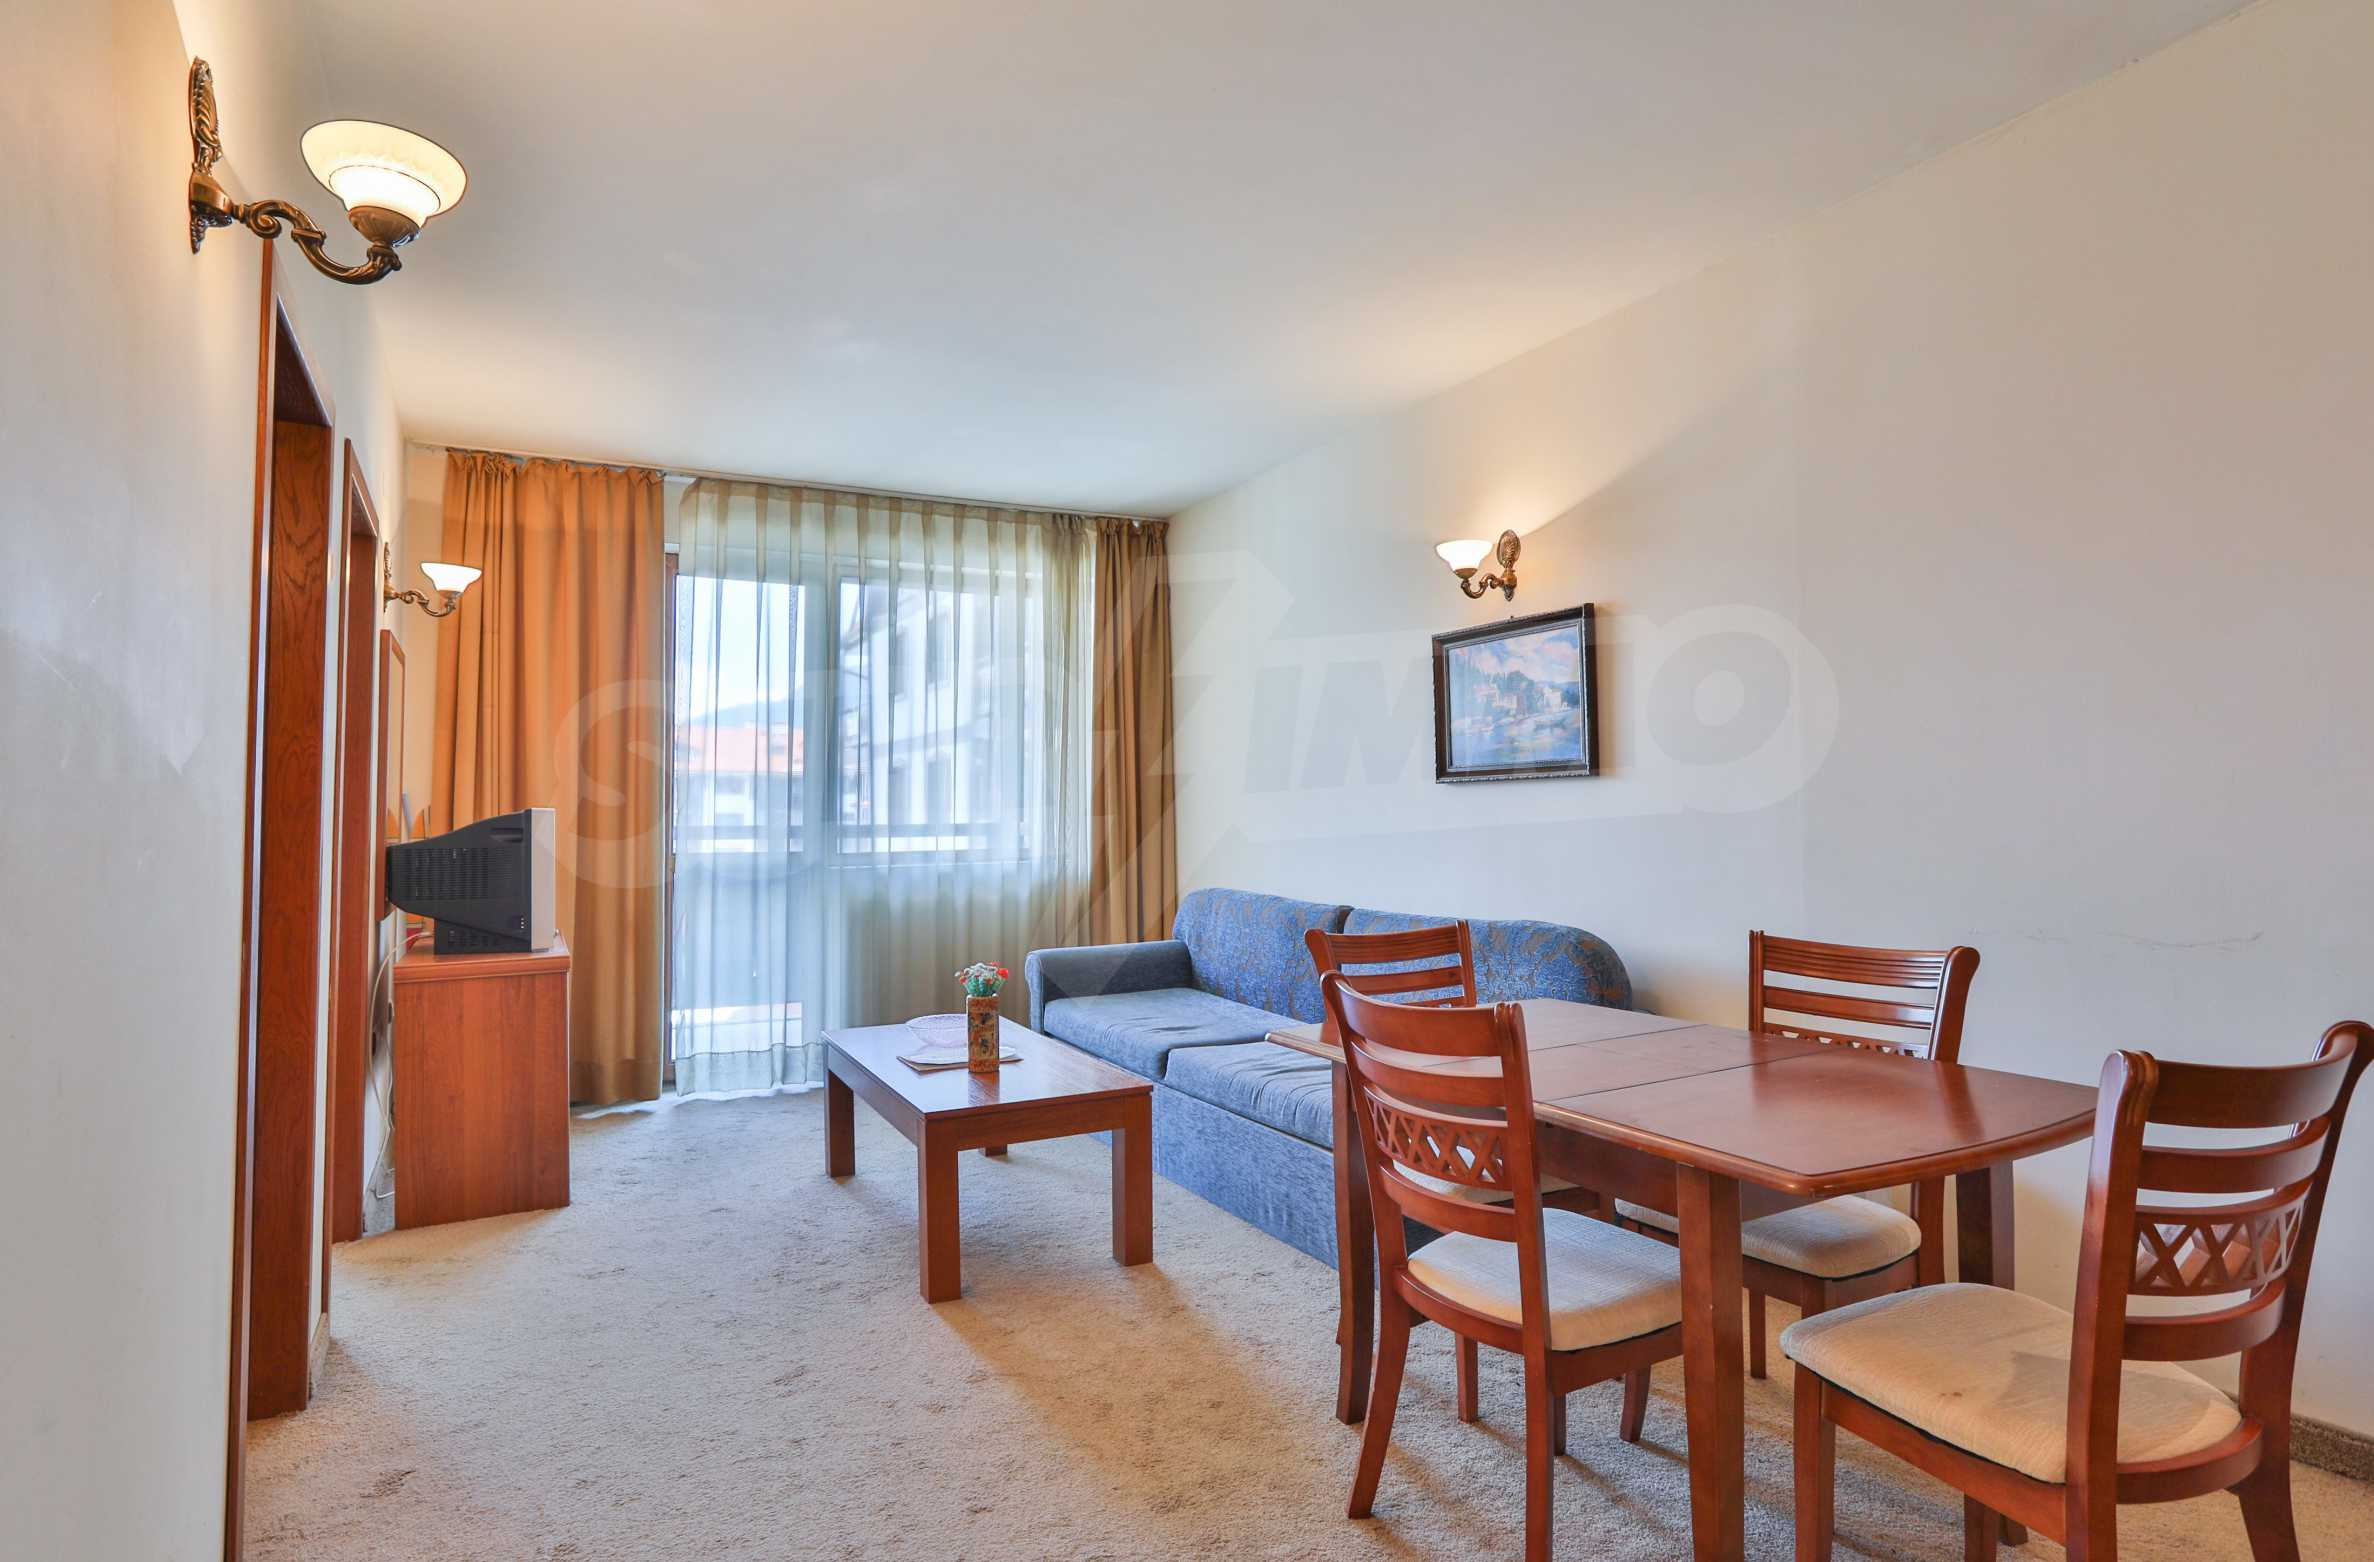 Просторен тристаен апартамент, намиращ се в комплекс Емералд в Банско 2